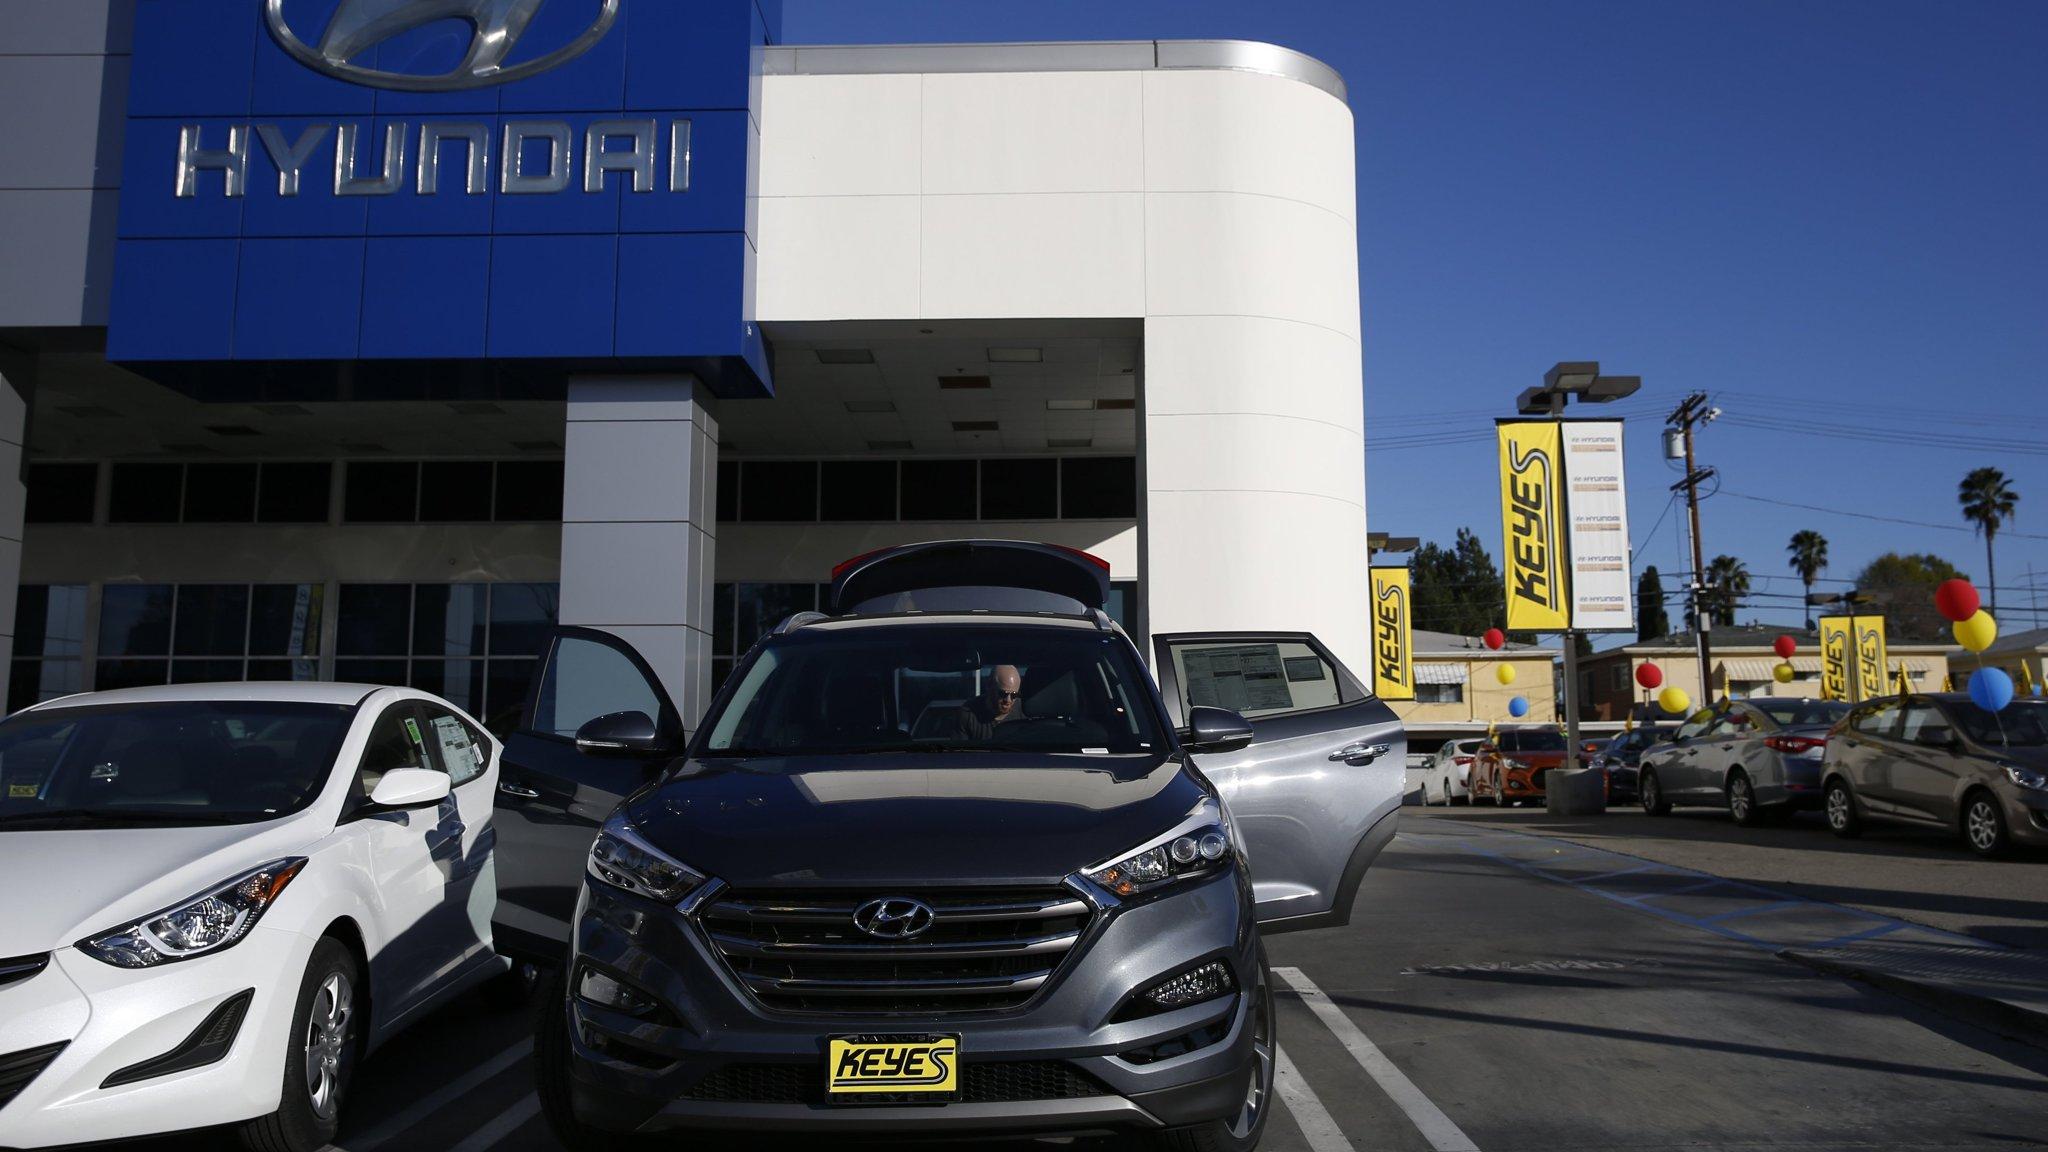 Hyundai kia motor finance company retail - Hyundai Kia Motor Finance Company Retail 5